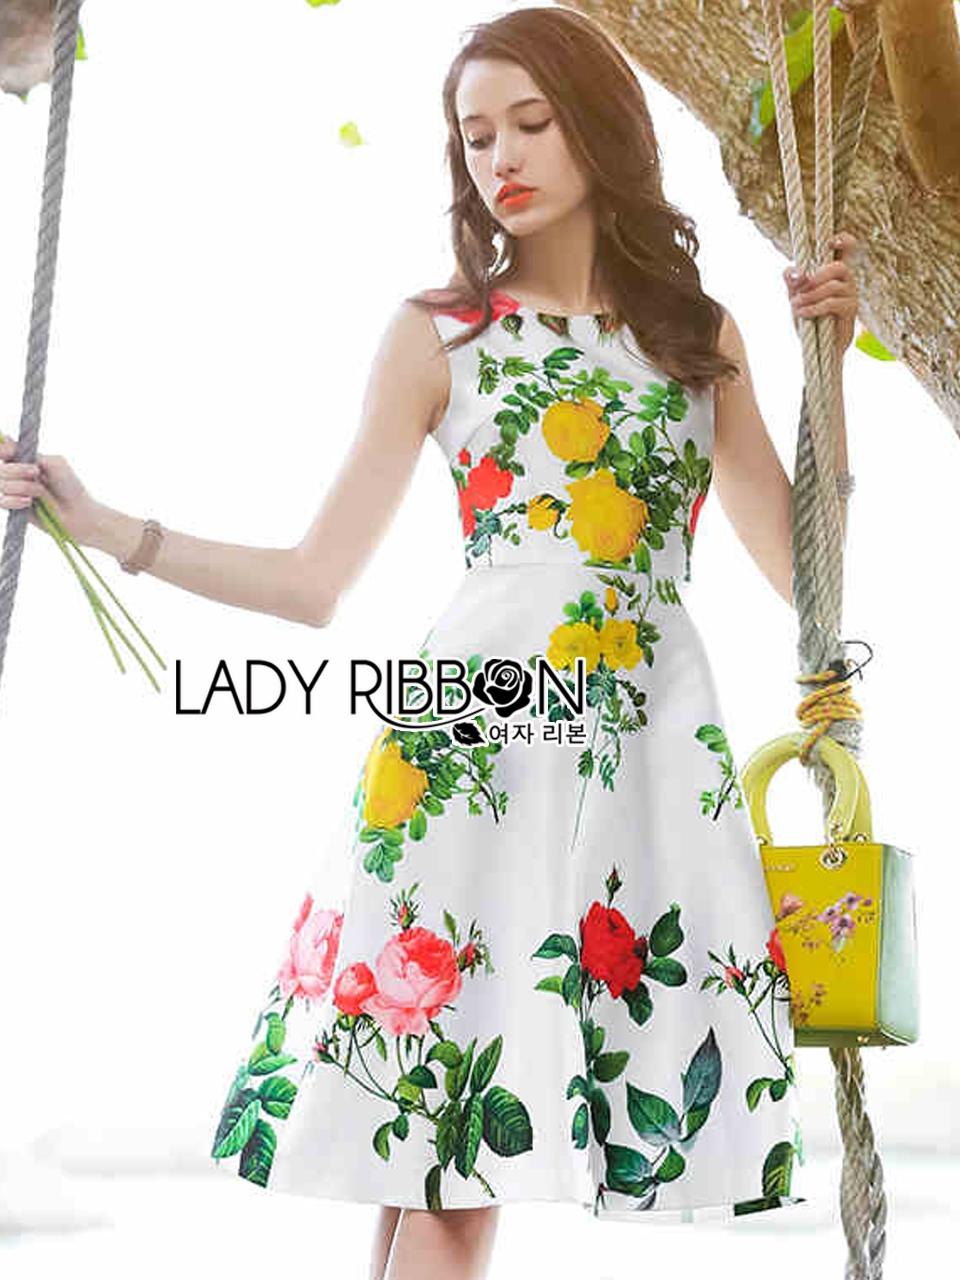 Lady Ribbon's Made Lady Rosie English Roses Printed White Sleeveless Dress